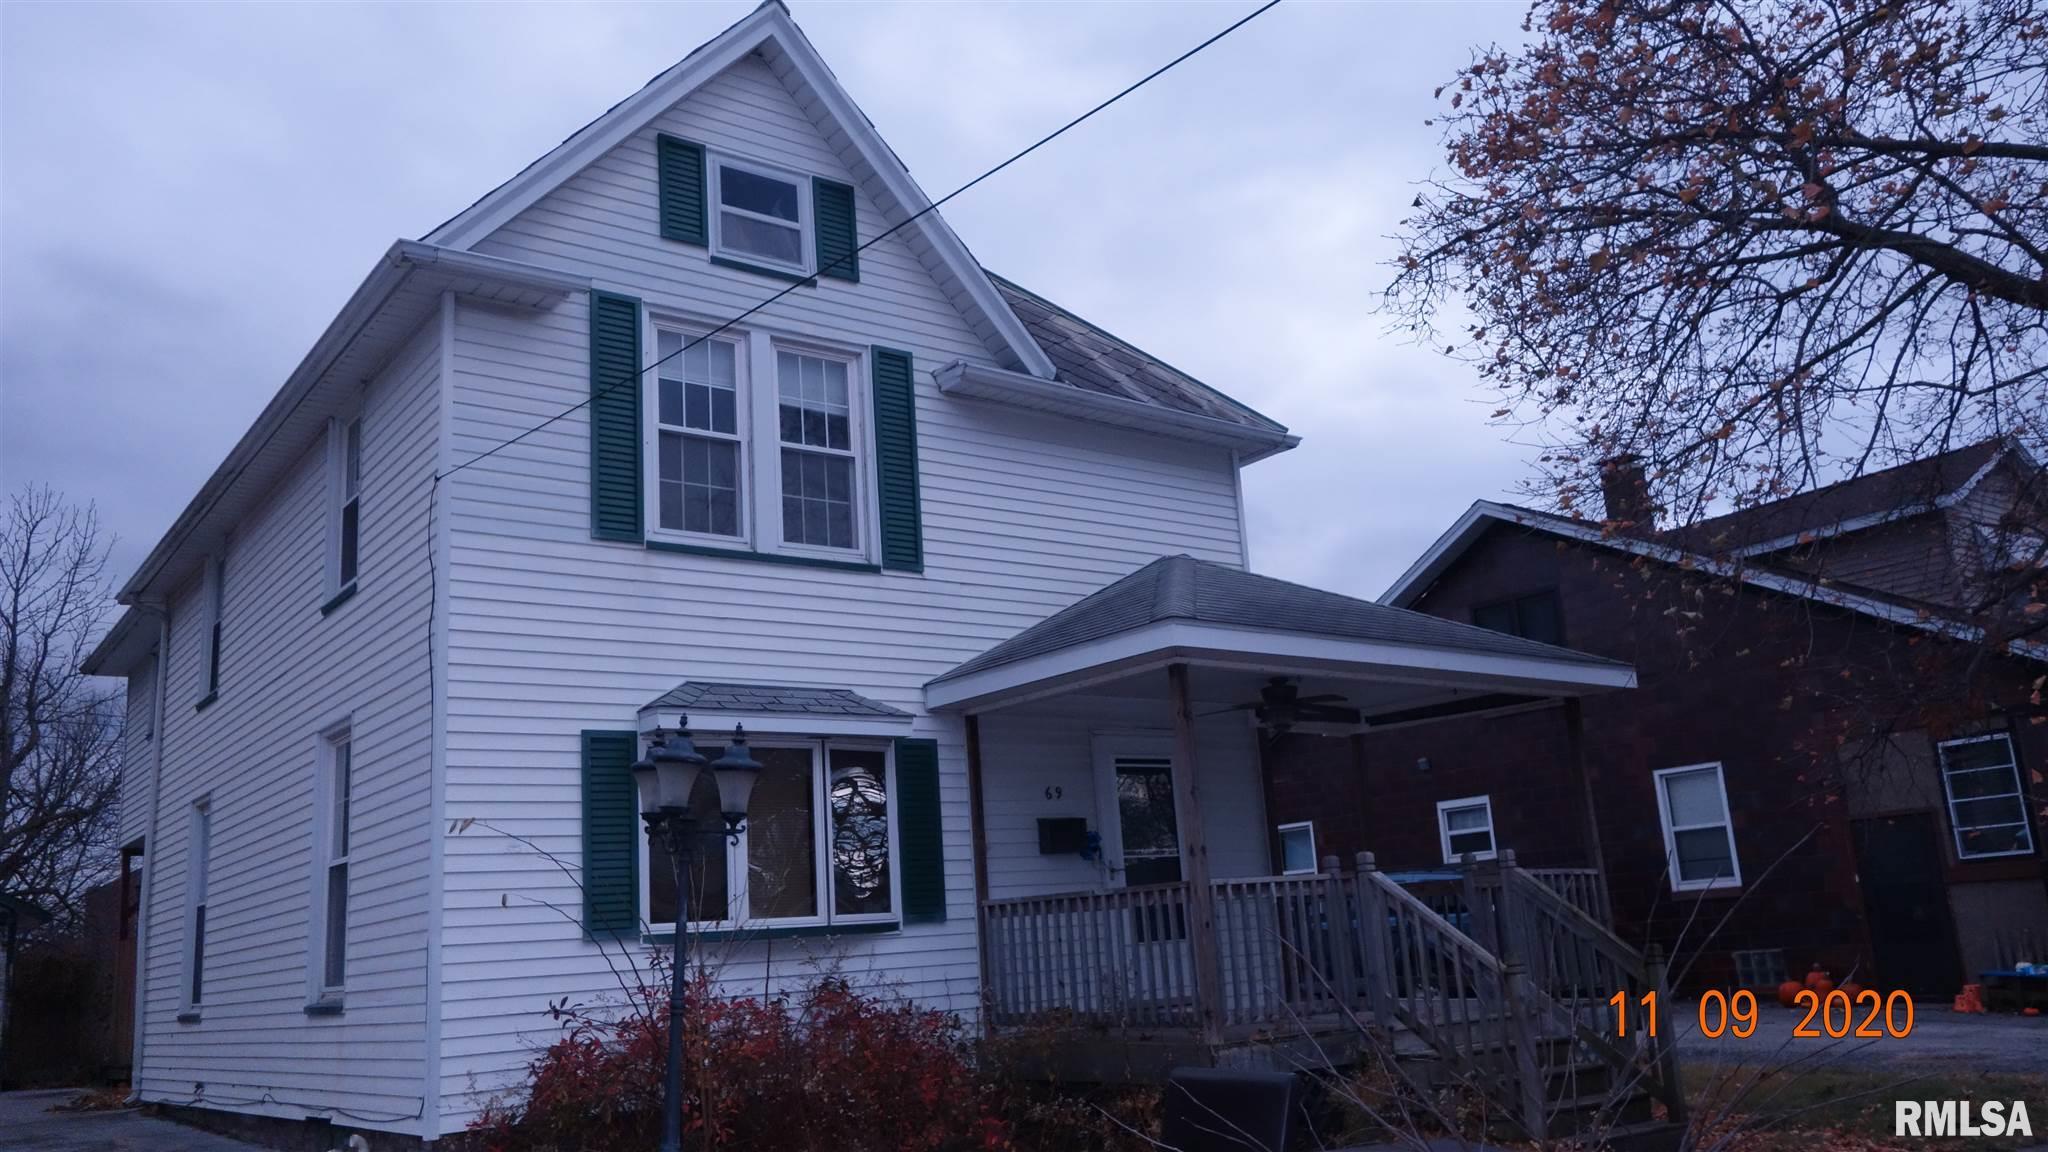 69 N WEST Property Photo - Farmington, IL real estate listing